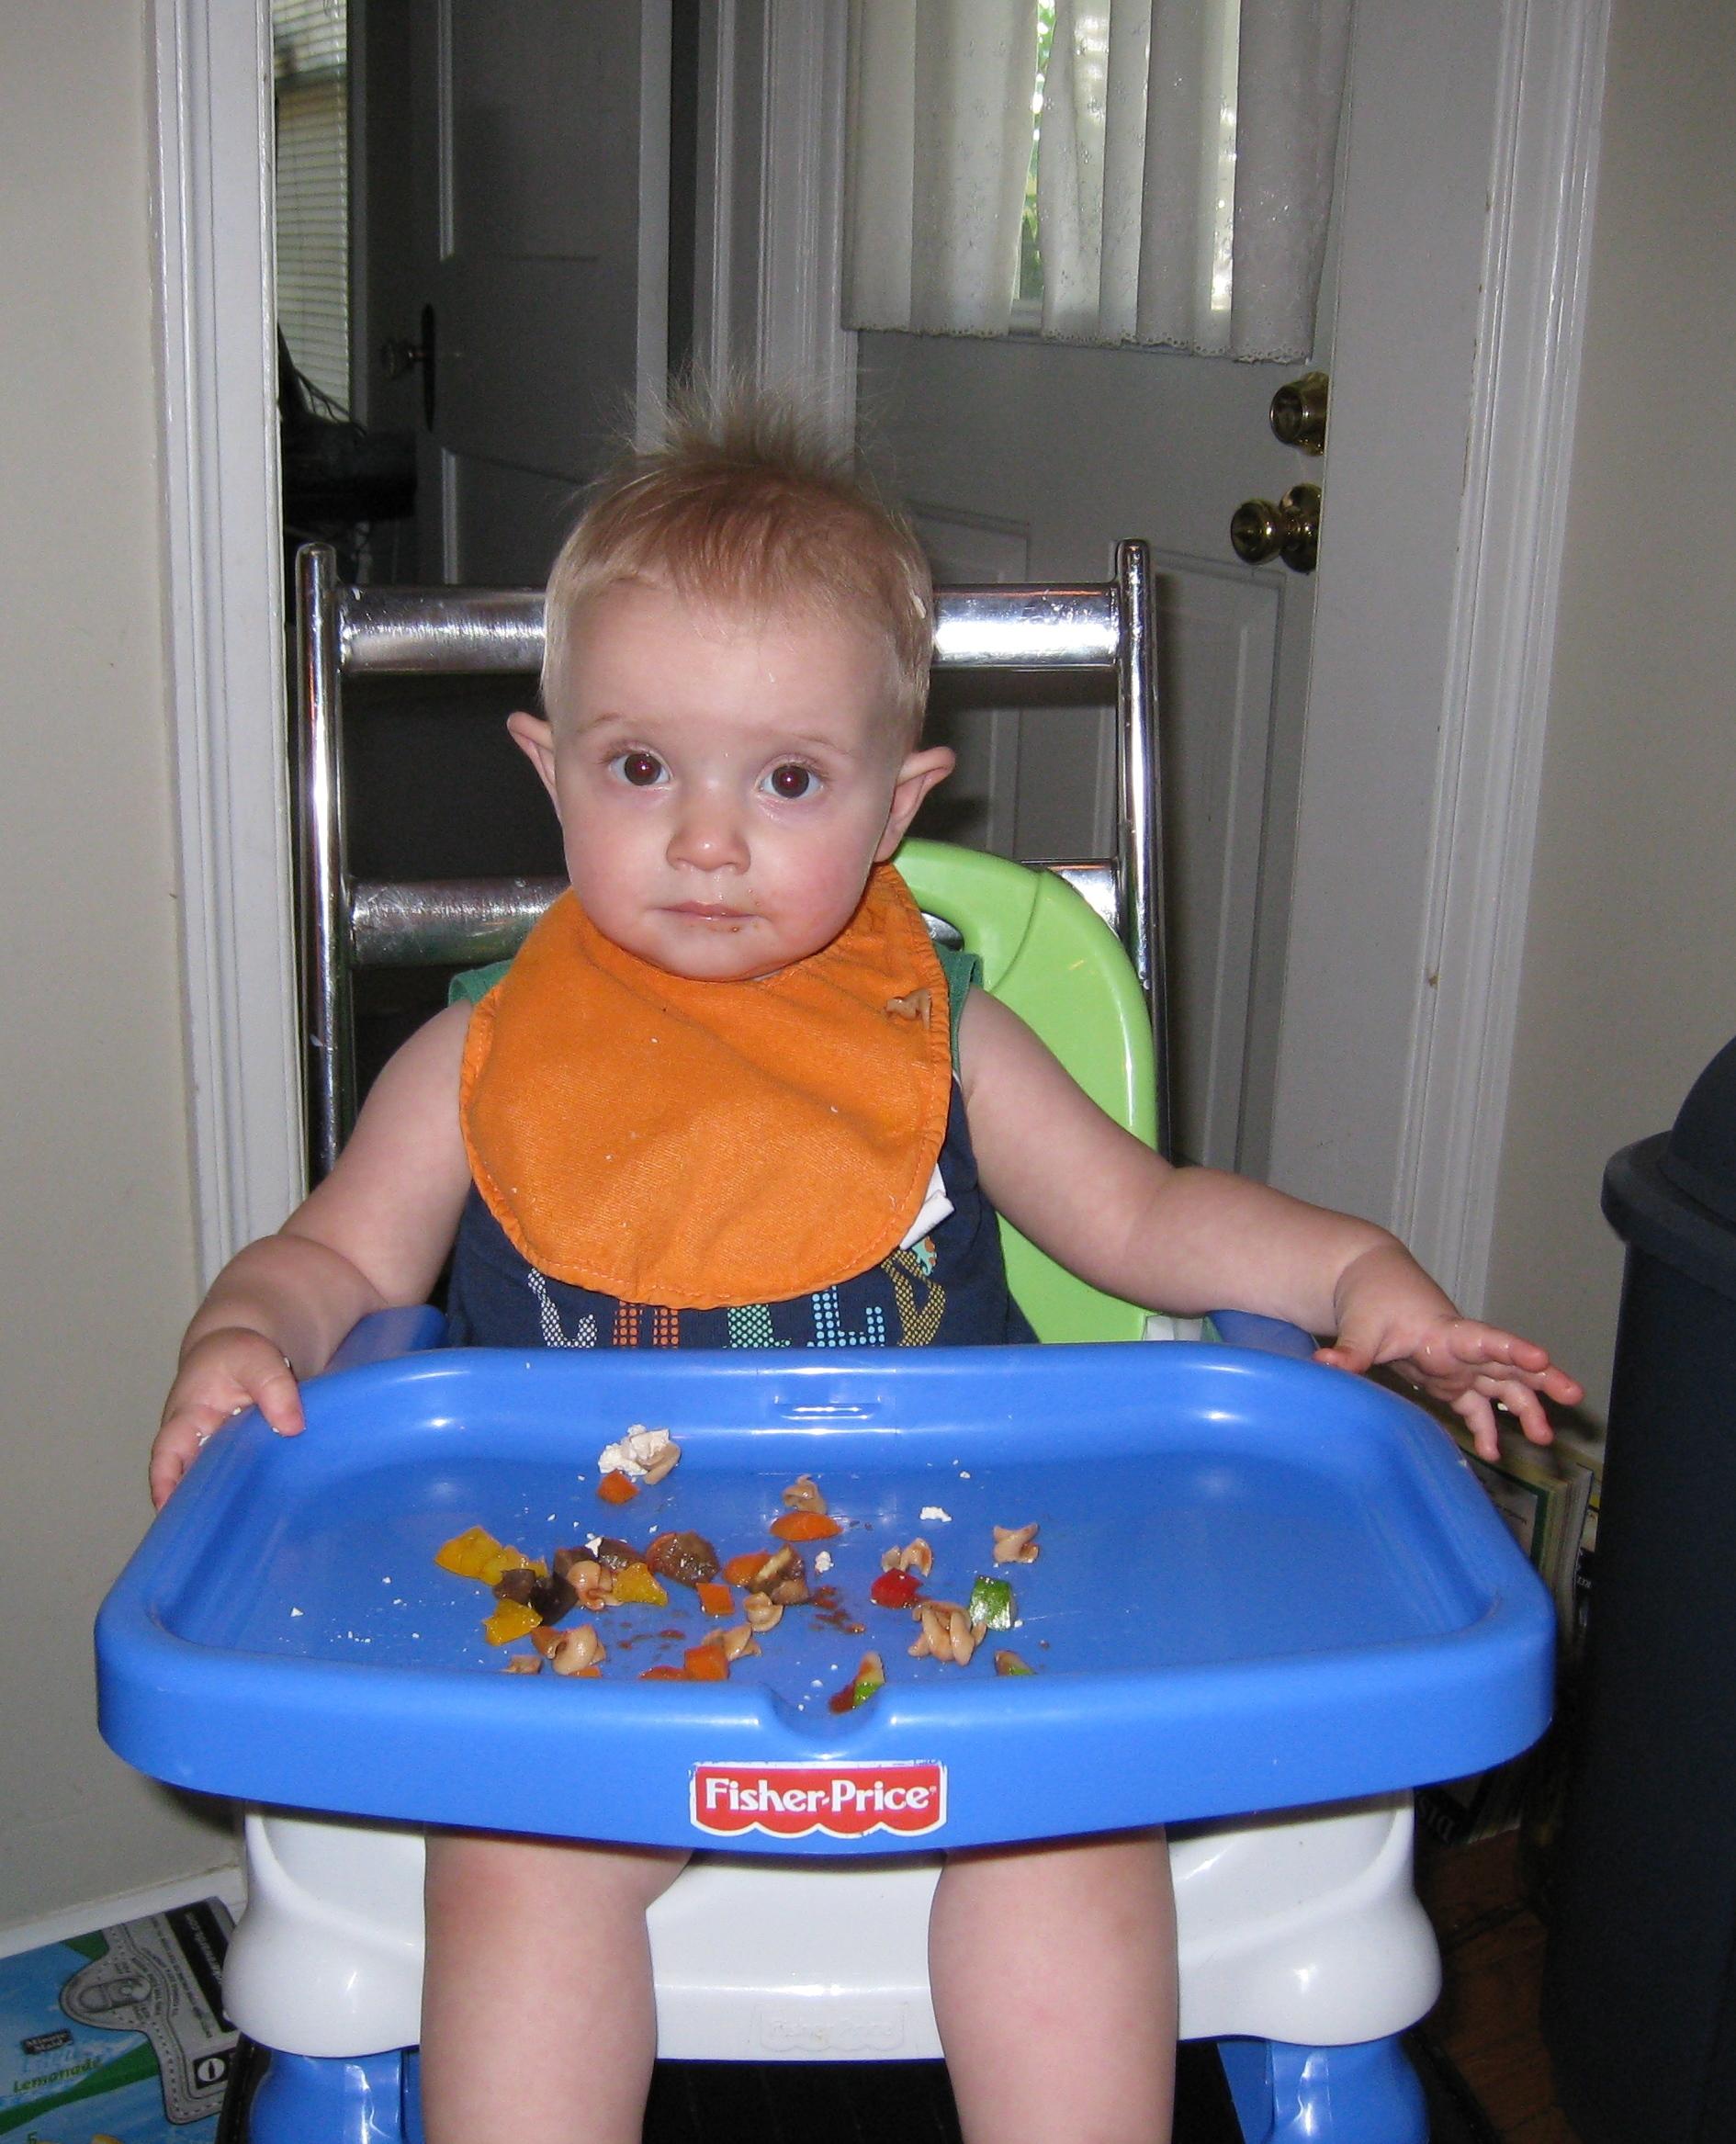 kivrin eating or not eating the veggies